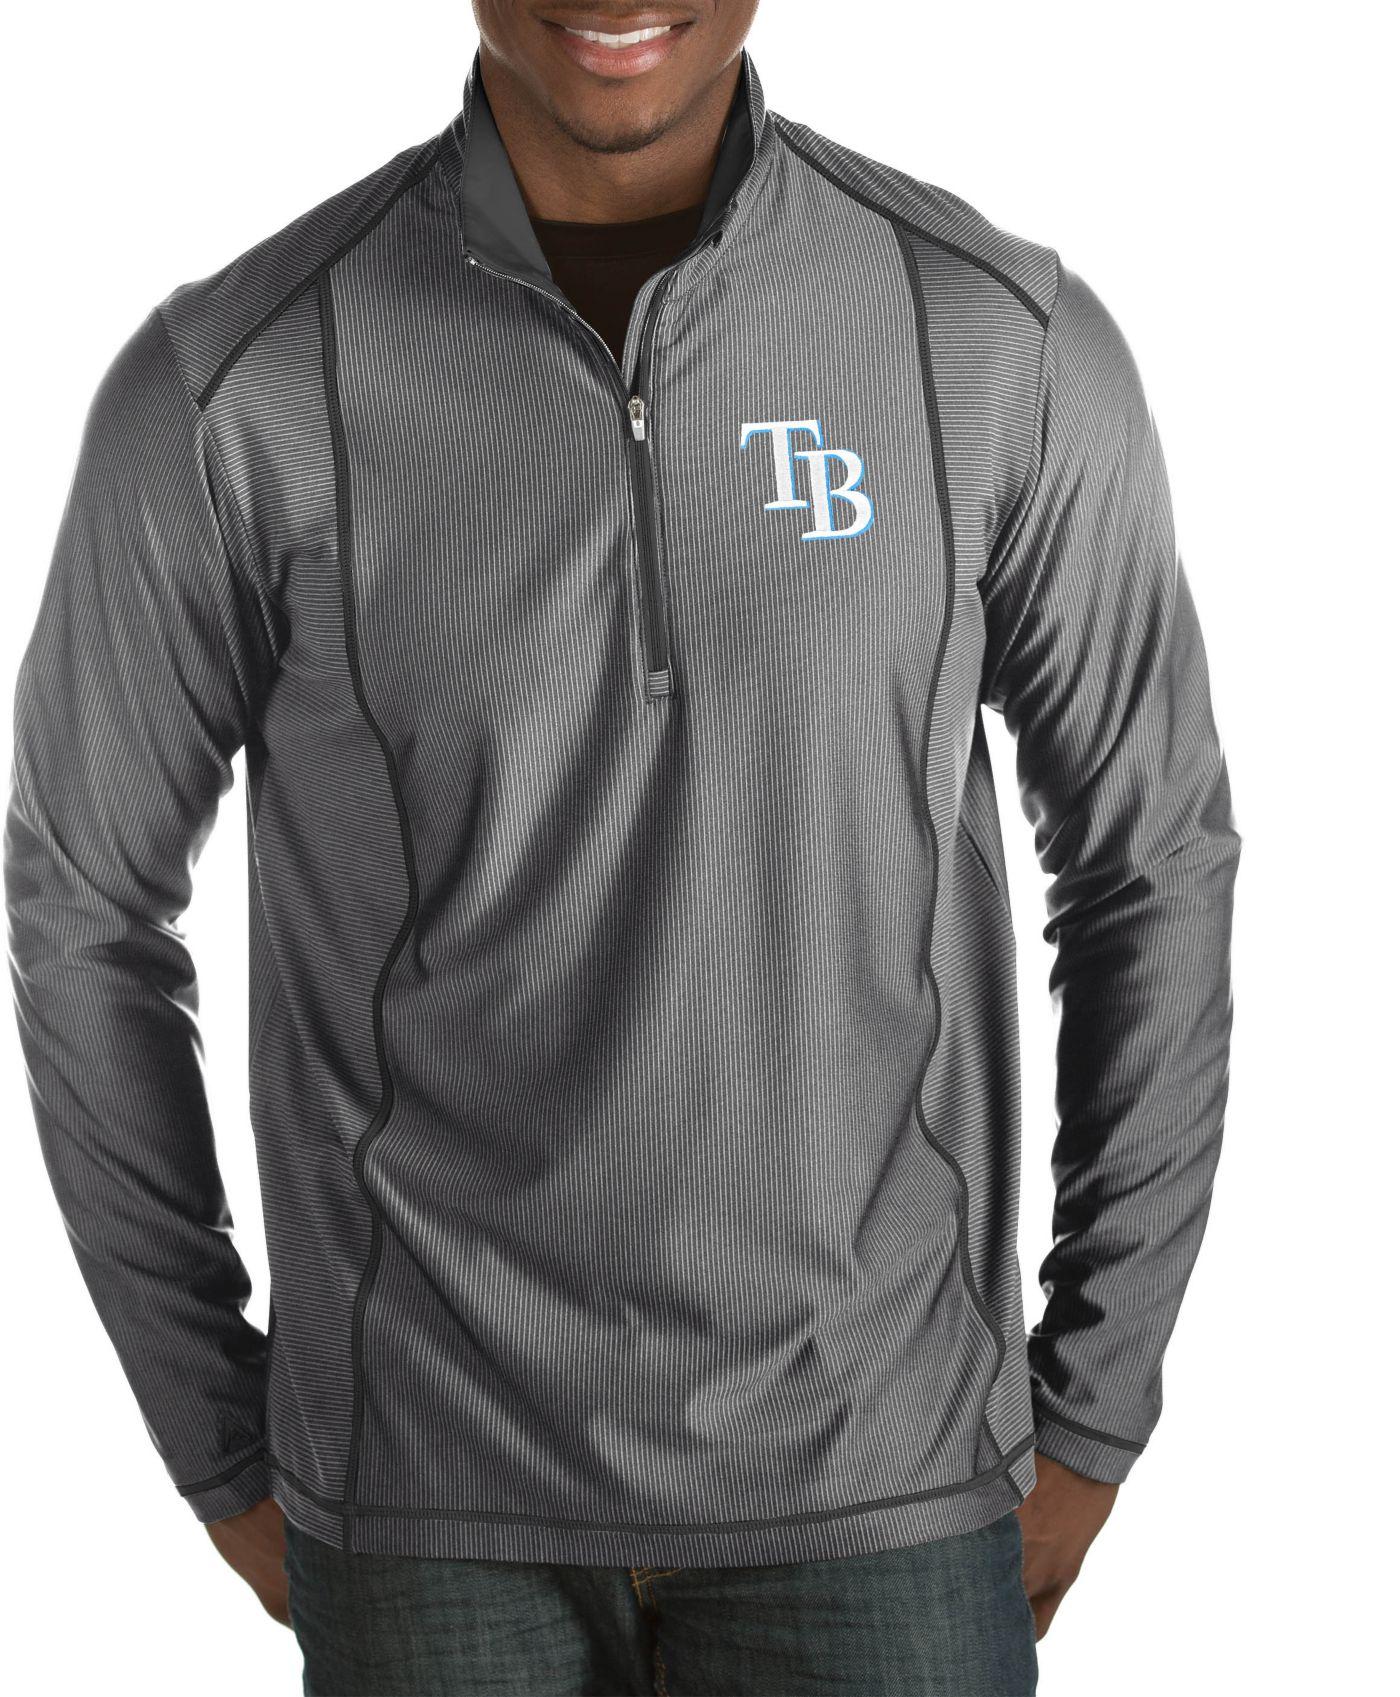 Antigua Men's Tampa Bay Rays Tempo Grey Quarter-Zip Pullover